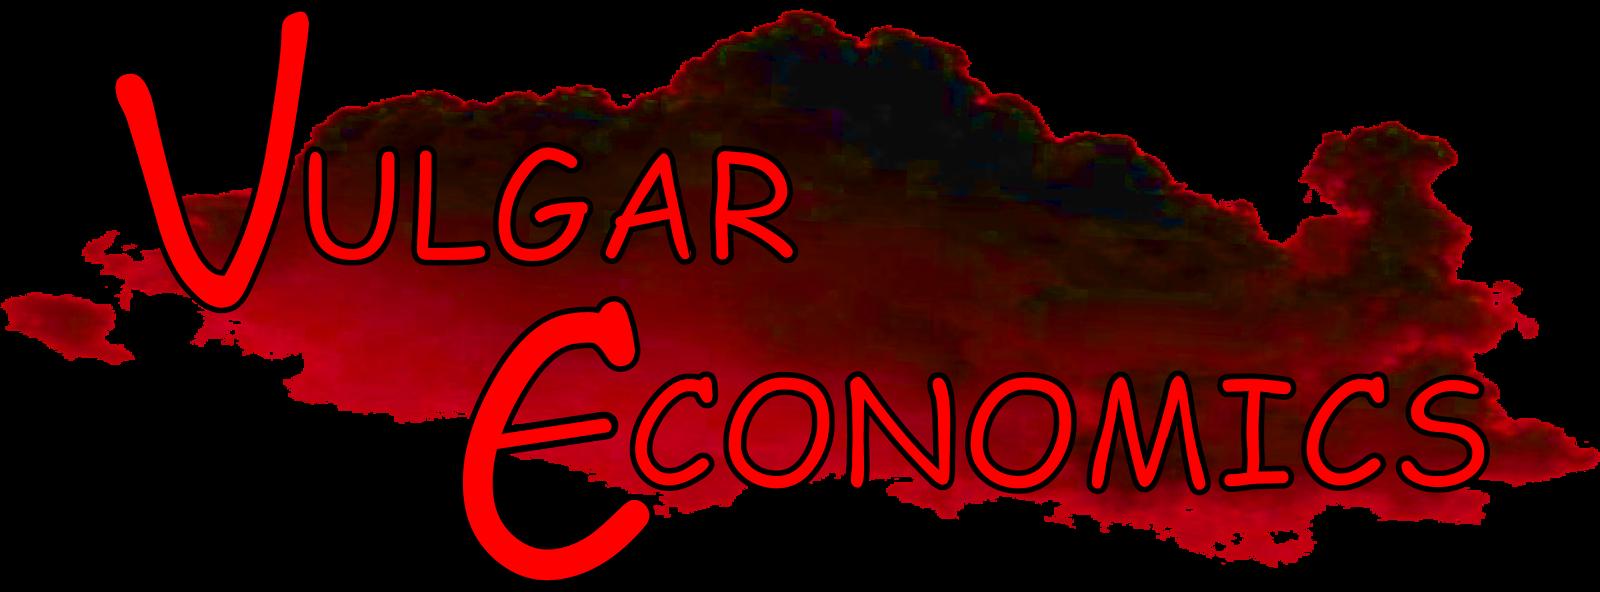 Vulgar Economics